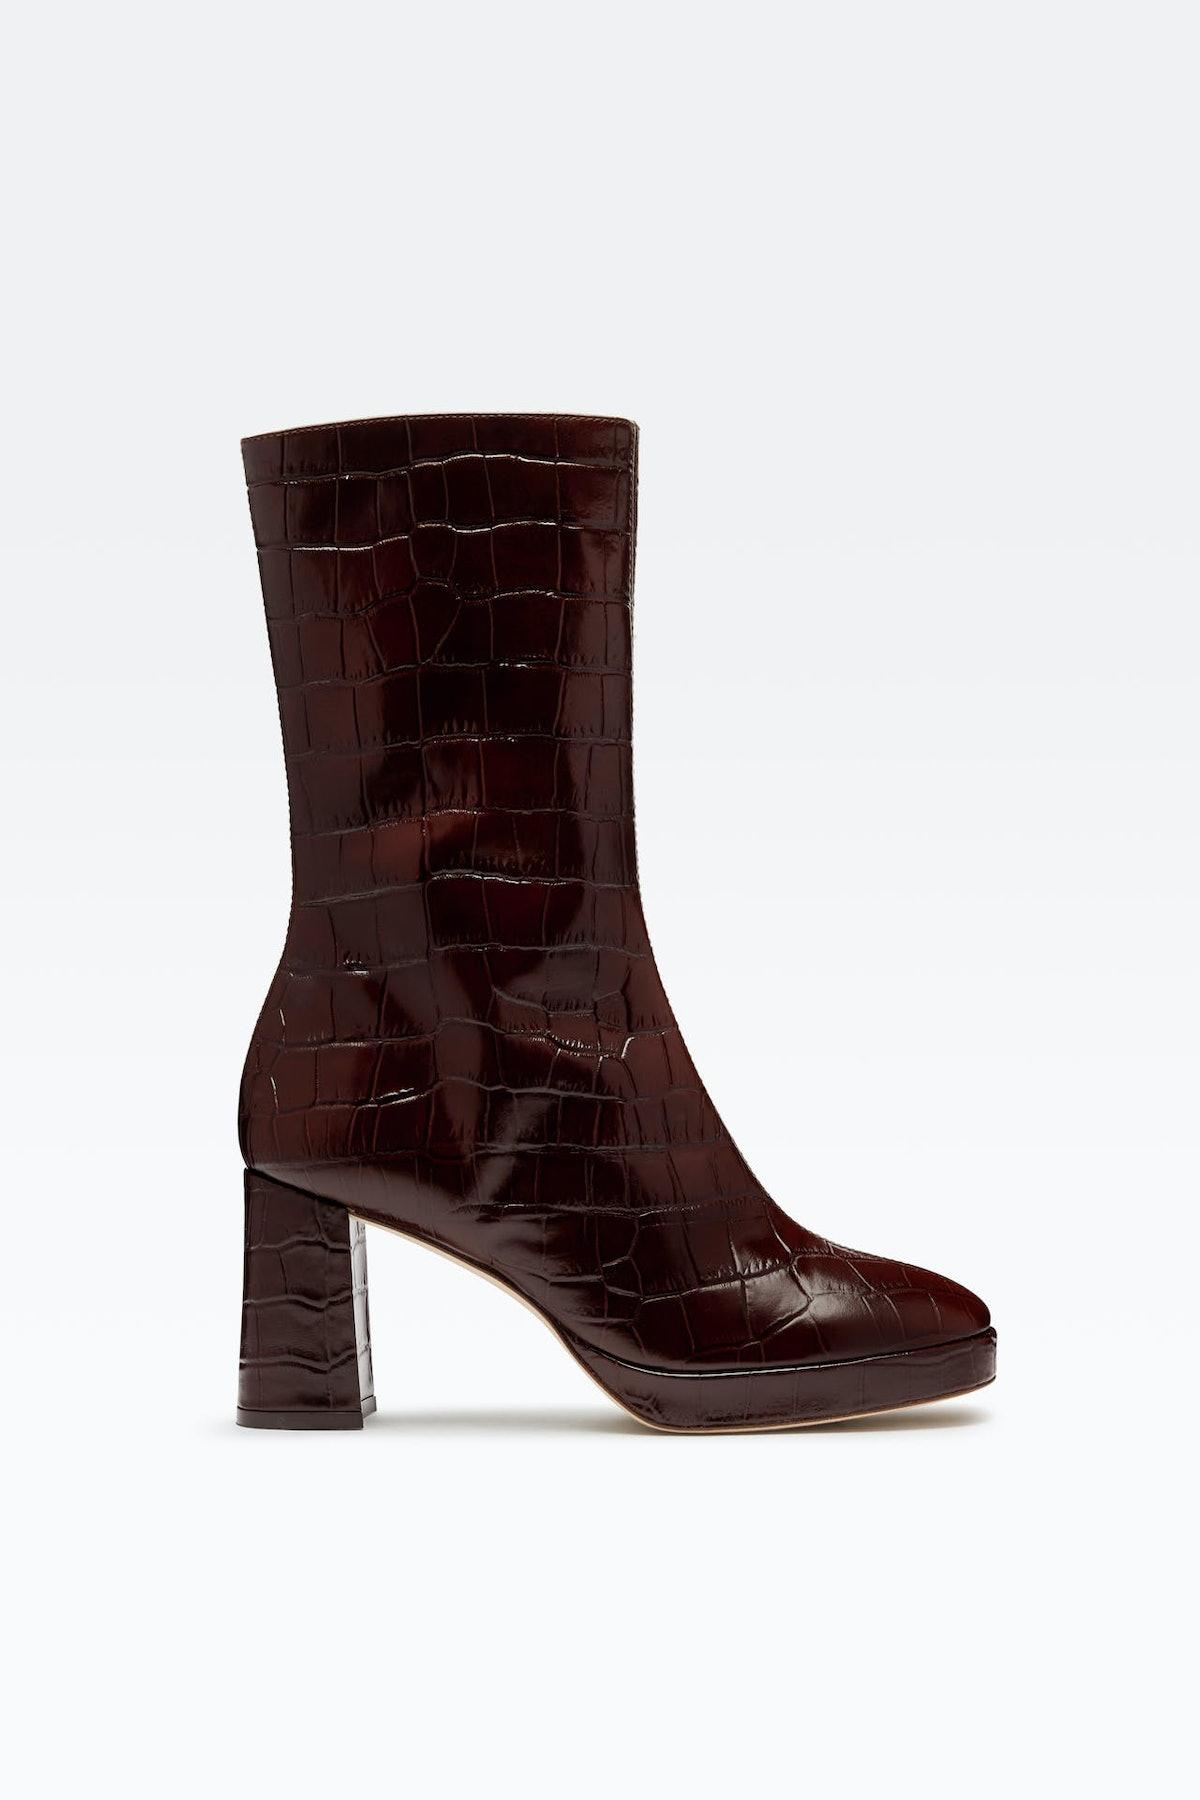 Carlota Brown Boots